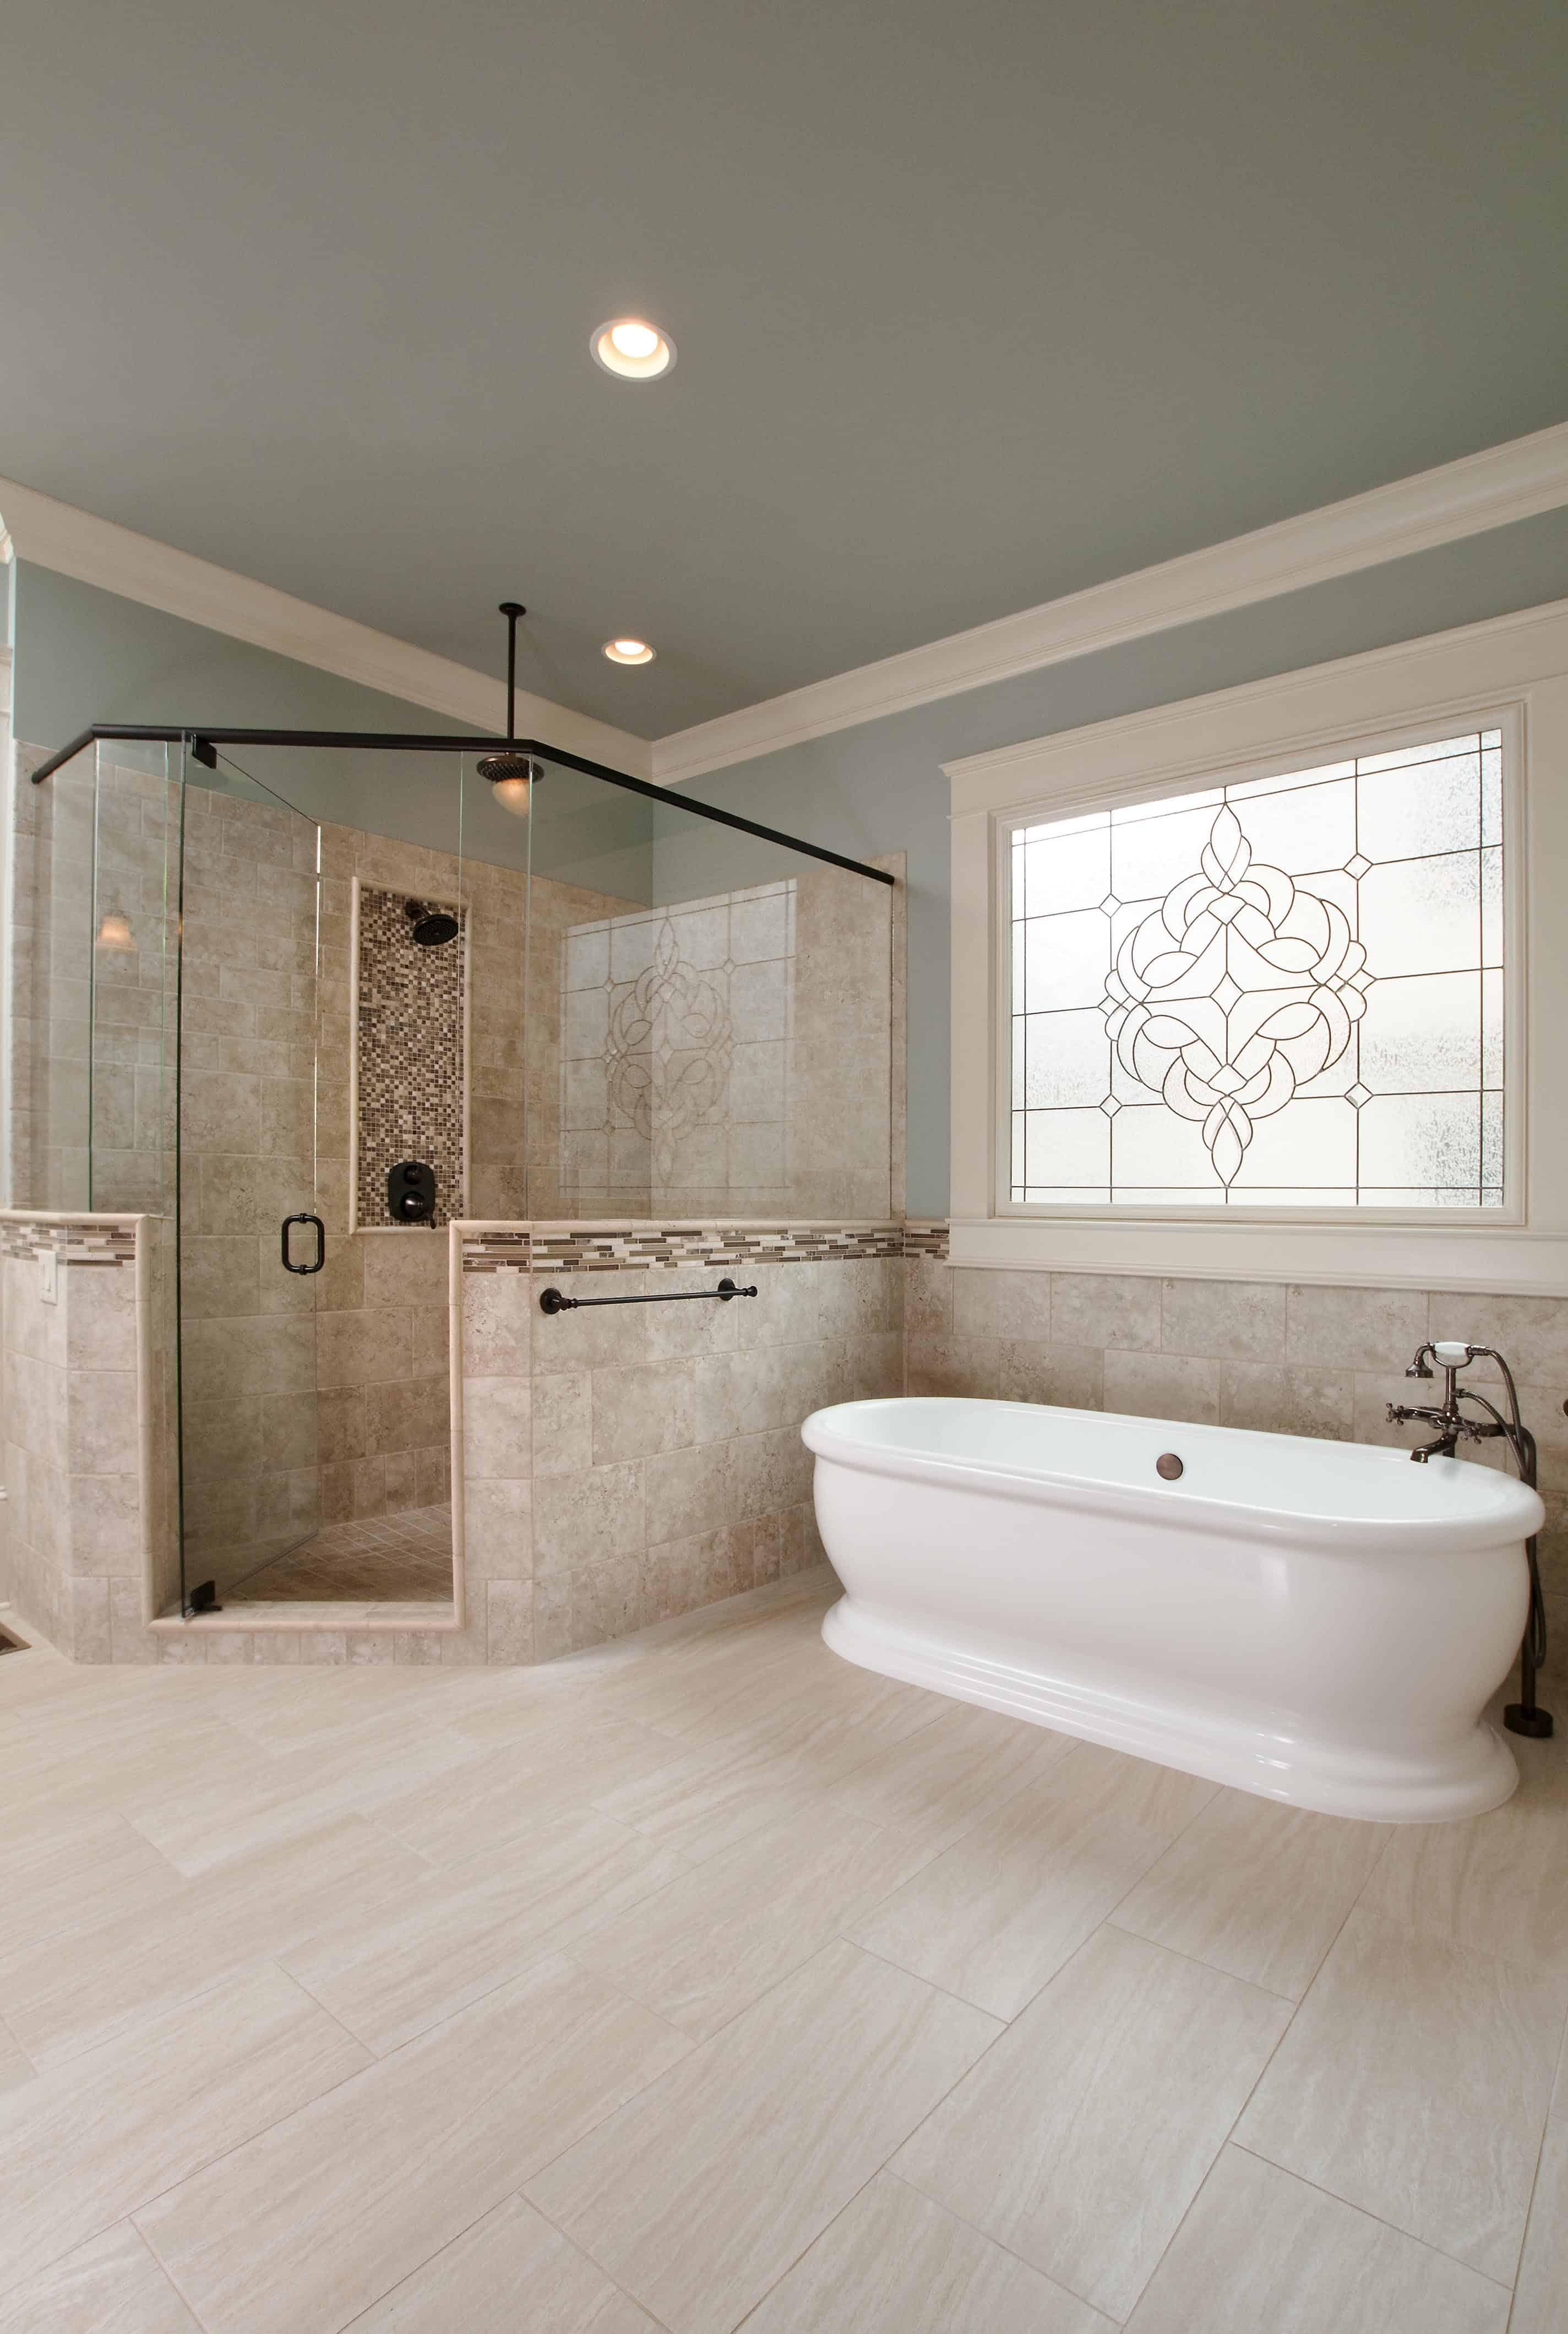 Soaking Bathtub in spacious bathroom